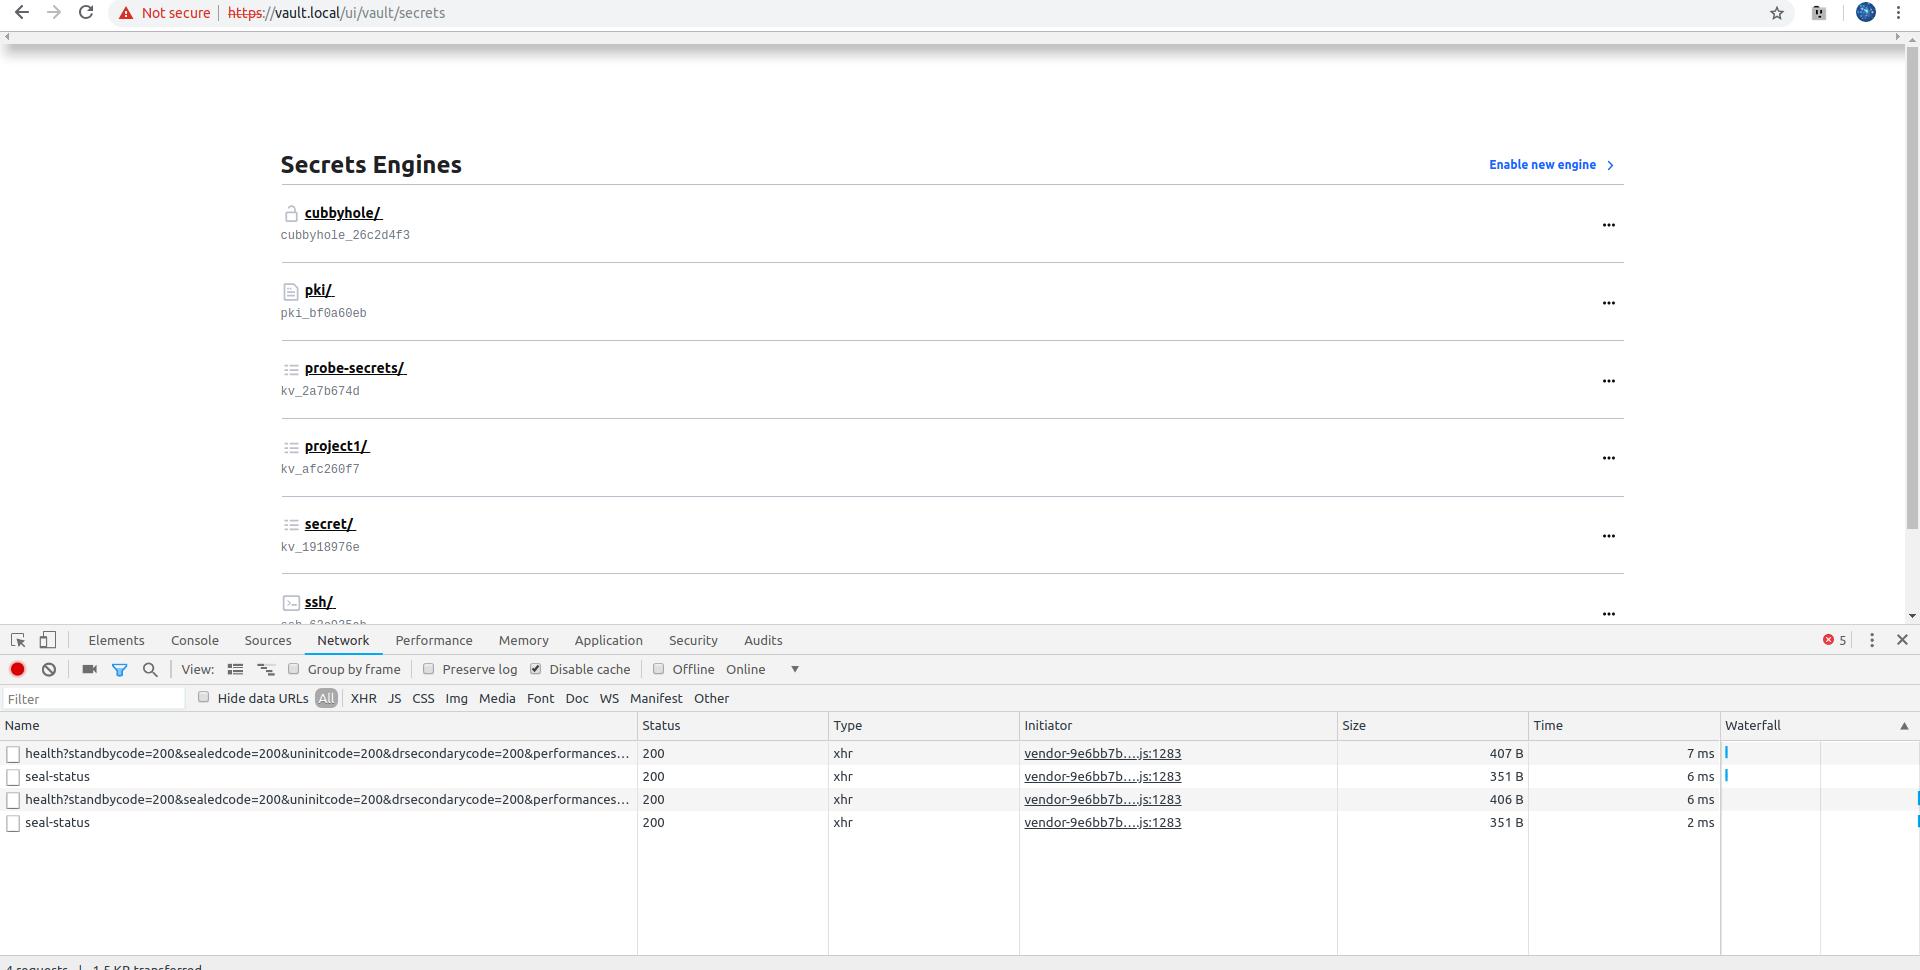 1 0 0 Web UI cli fullscreen not working · Issue #5901